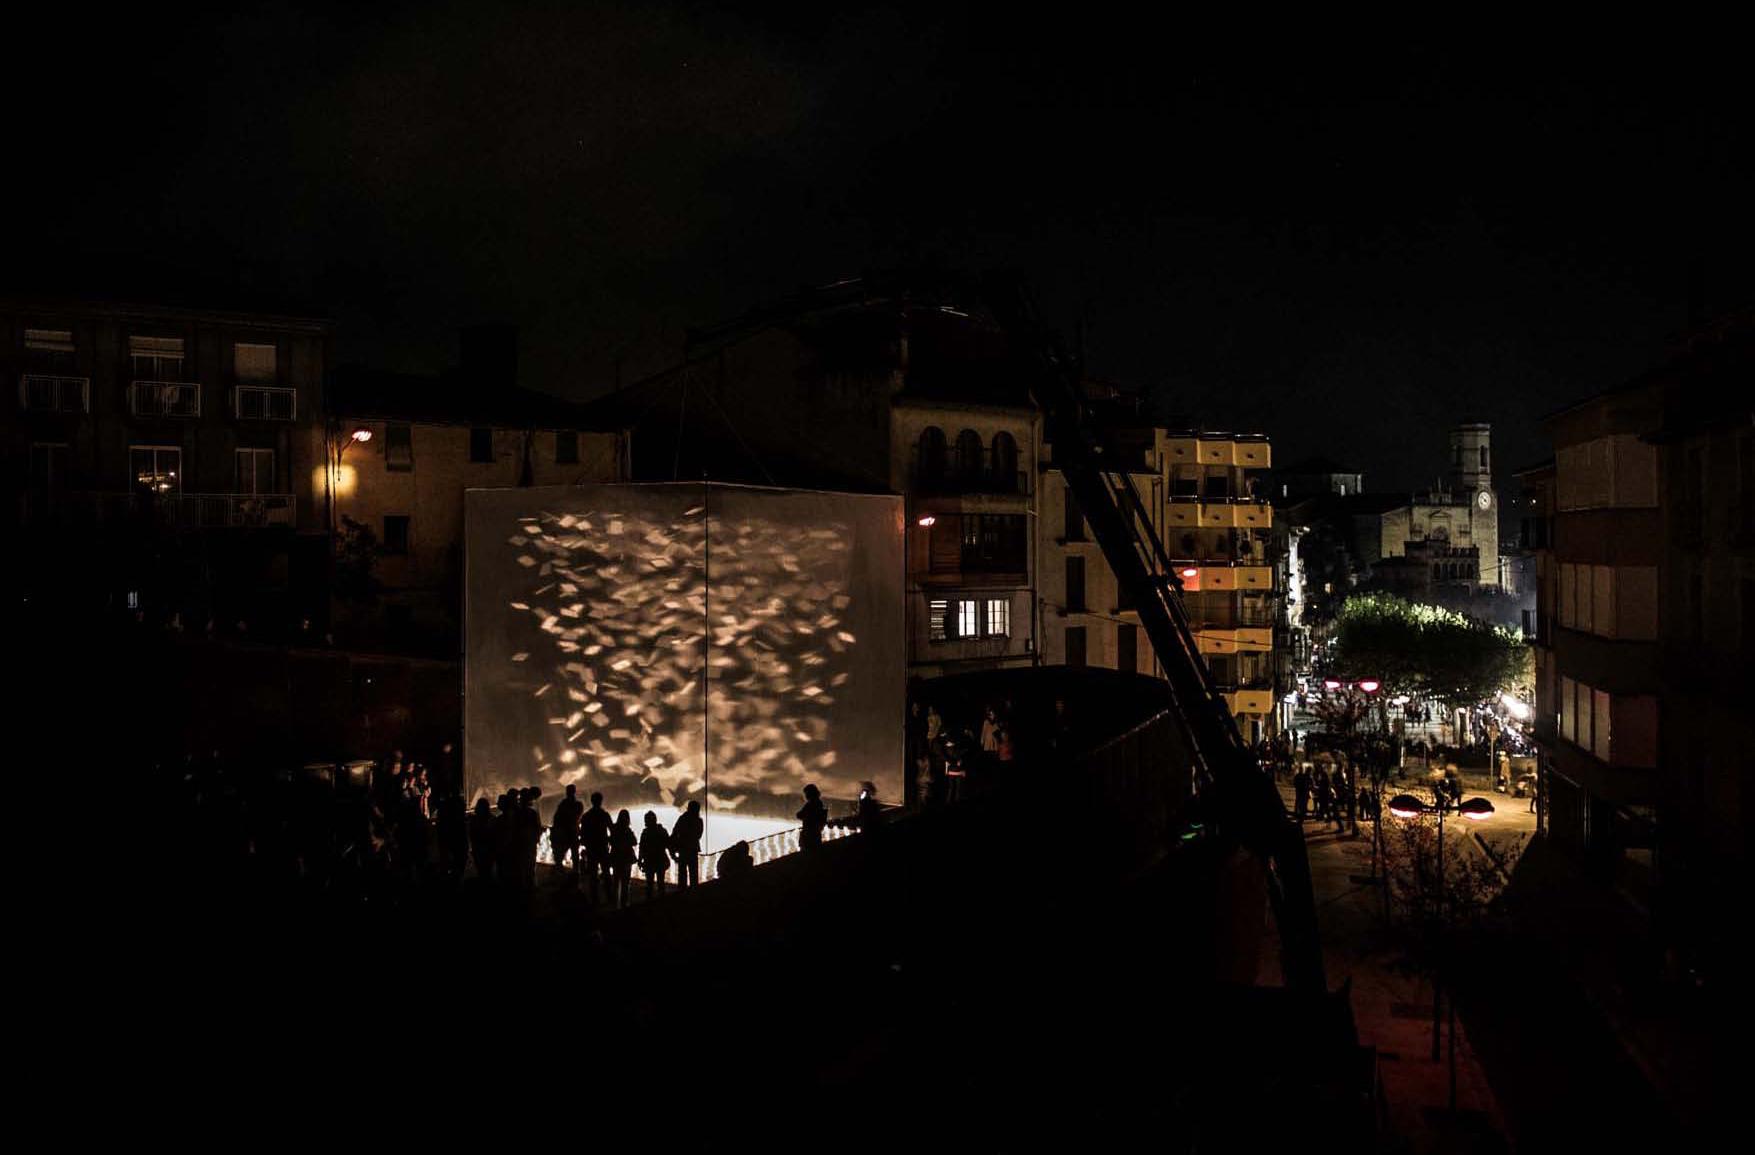 foto: Jordi Hidalgo Tané